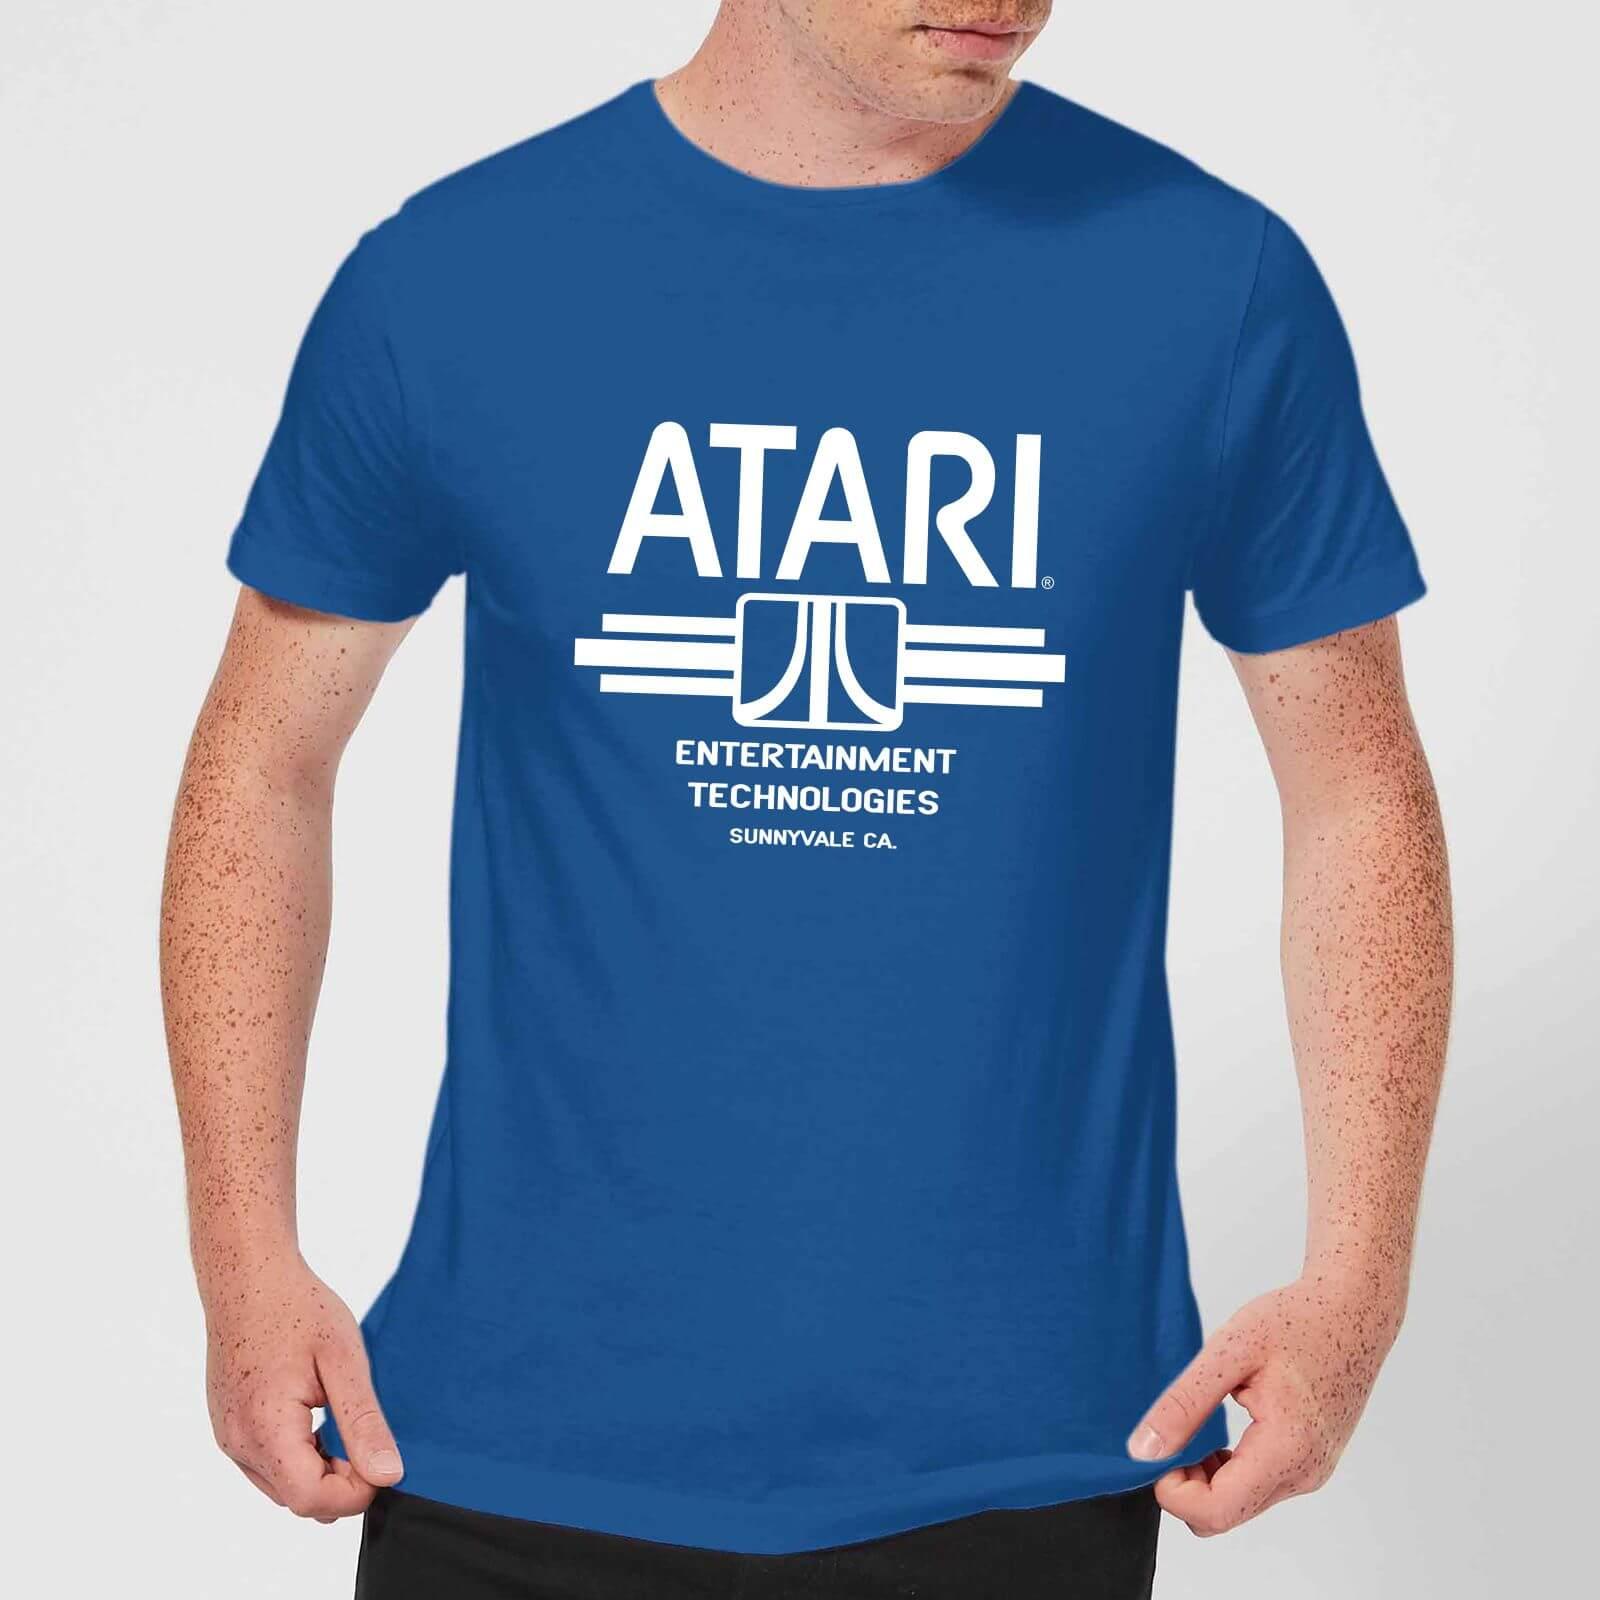 Atari Ent Tech Men's T-Shirt - Royal Blue - M - Royal Blue